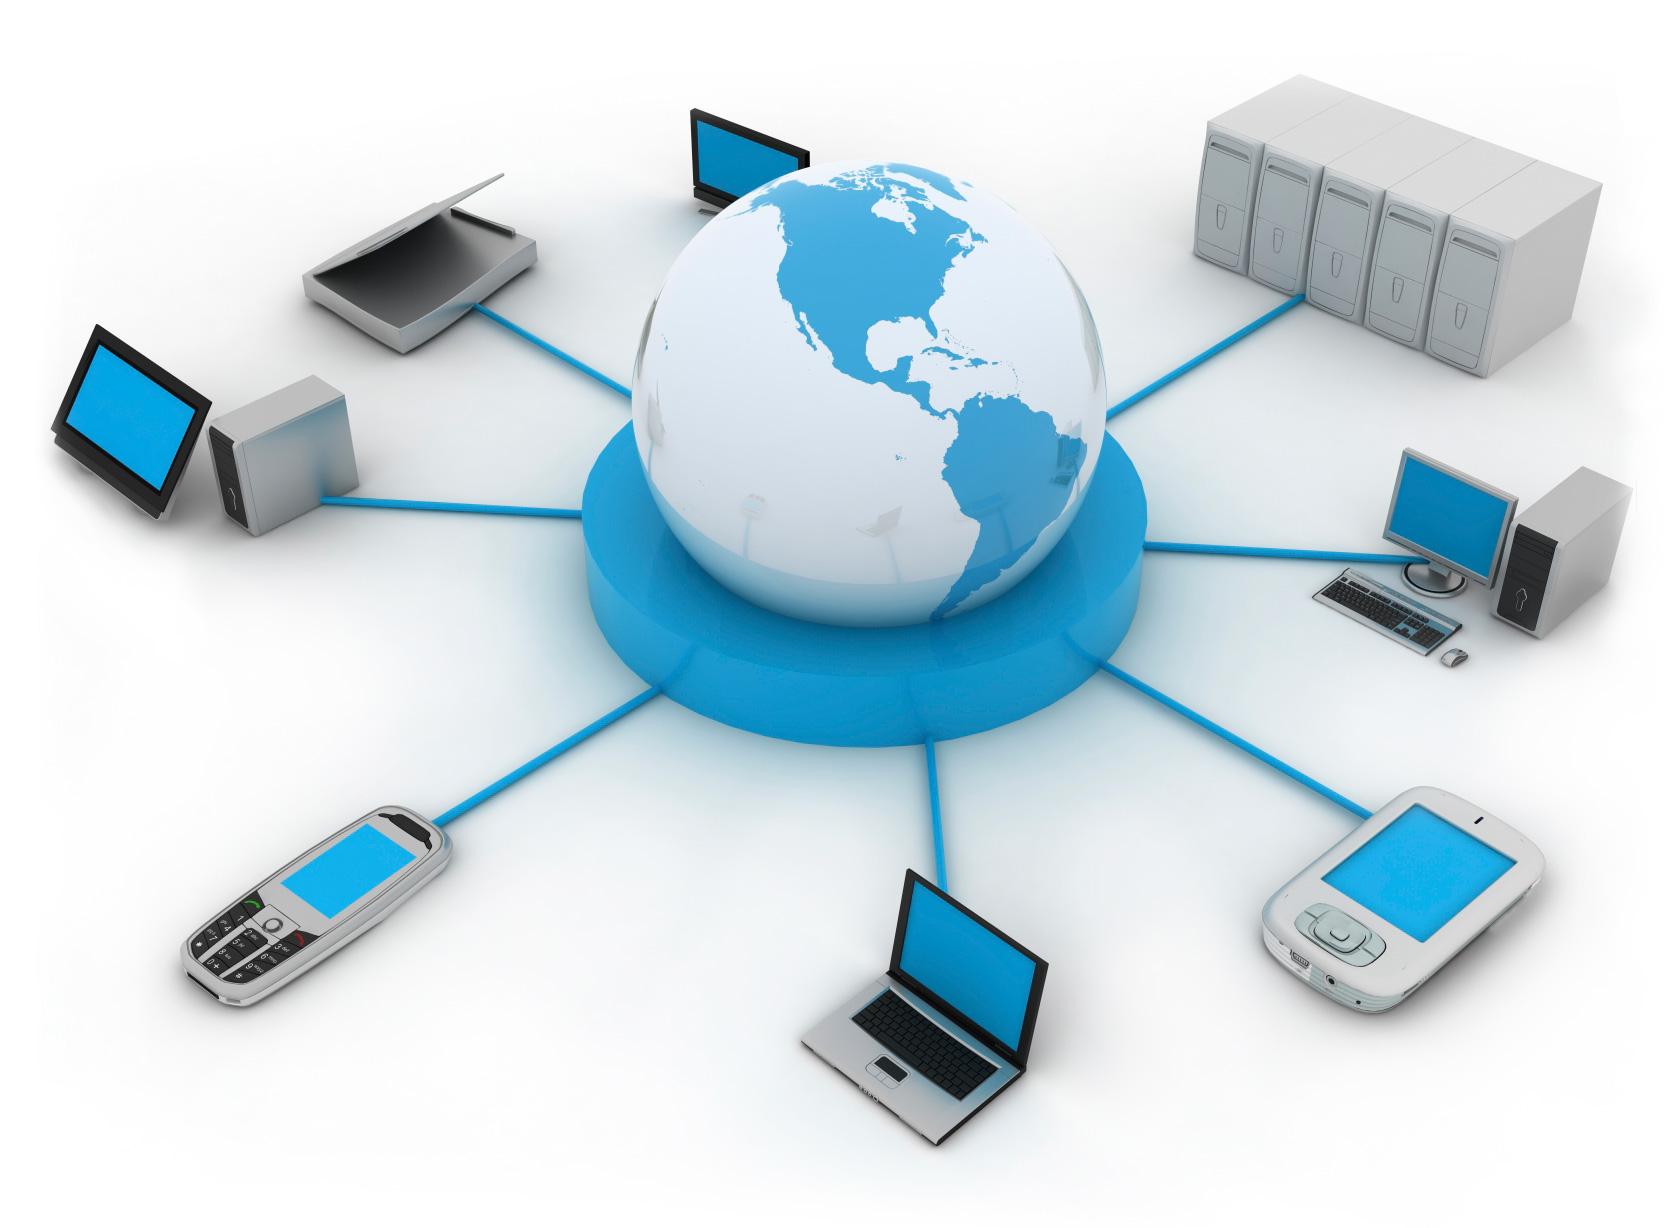 network-management-edit.jpg